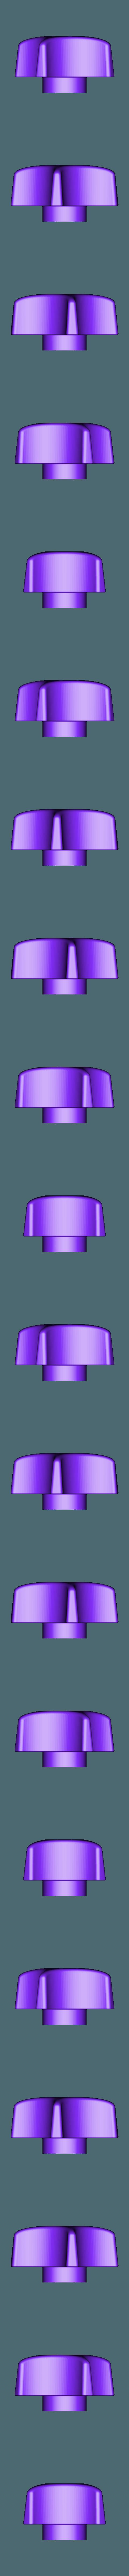 KnobUNC(1-4(v2).stl Download STL file Sinar rail clamp (camera/tripod support) & F1 repairs • 3D printing object, vintage-lens